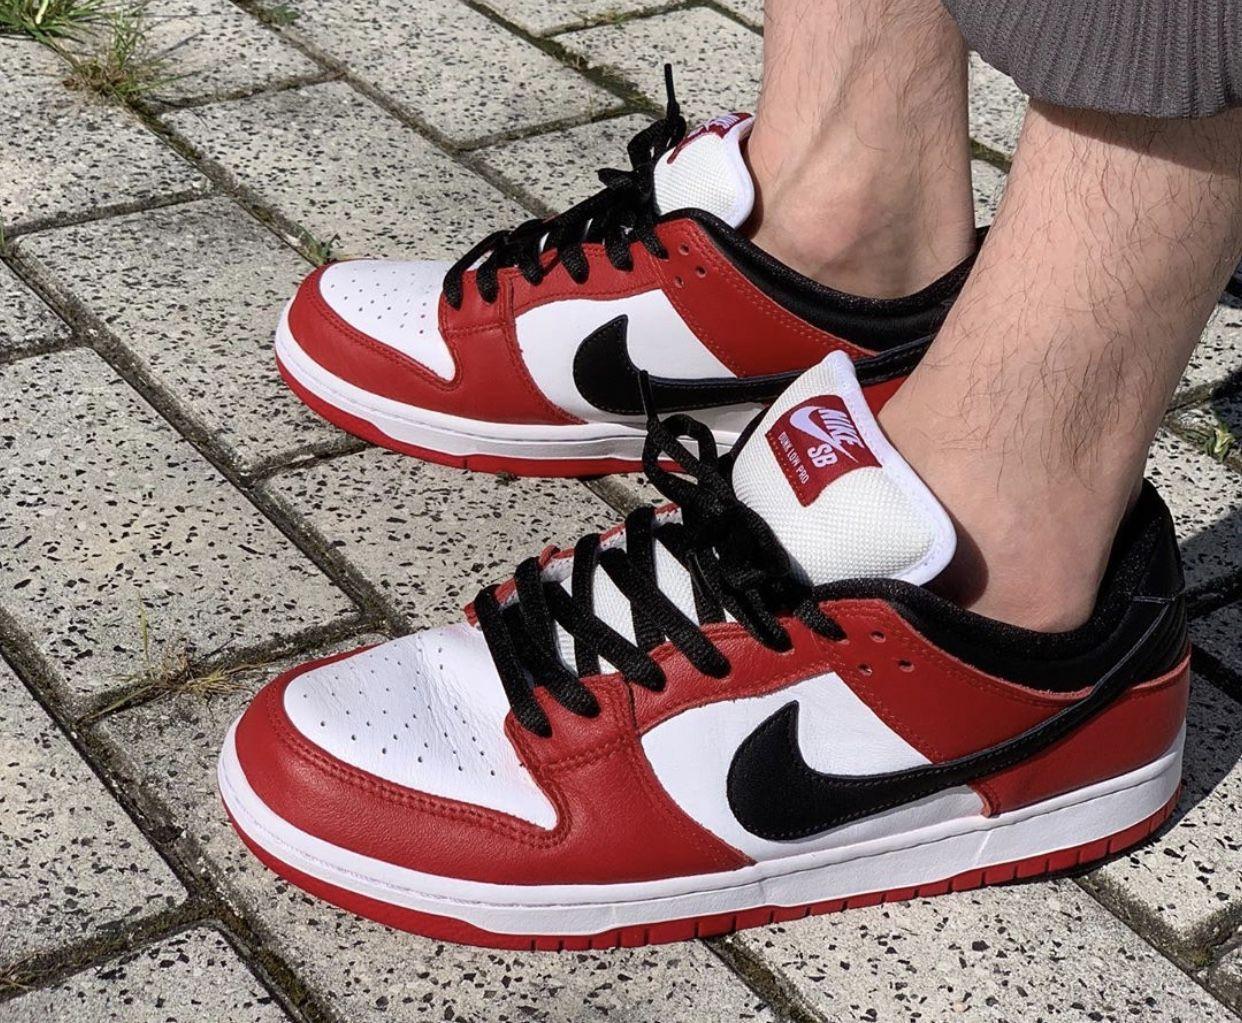 2020 Nike SB Dunk Low Pro Chicago | Nike fashion sneakers, Nike ...